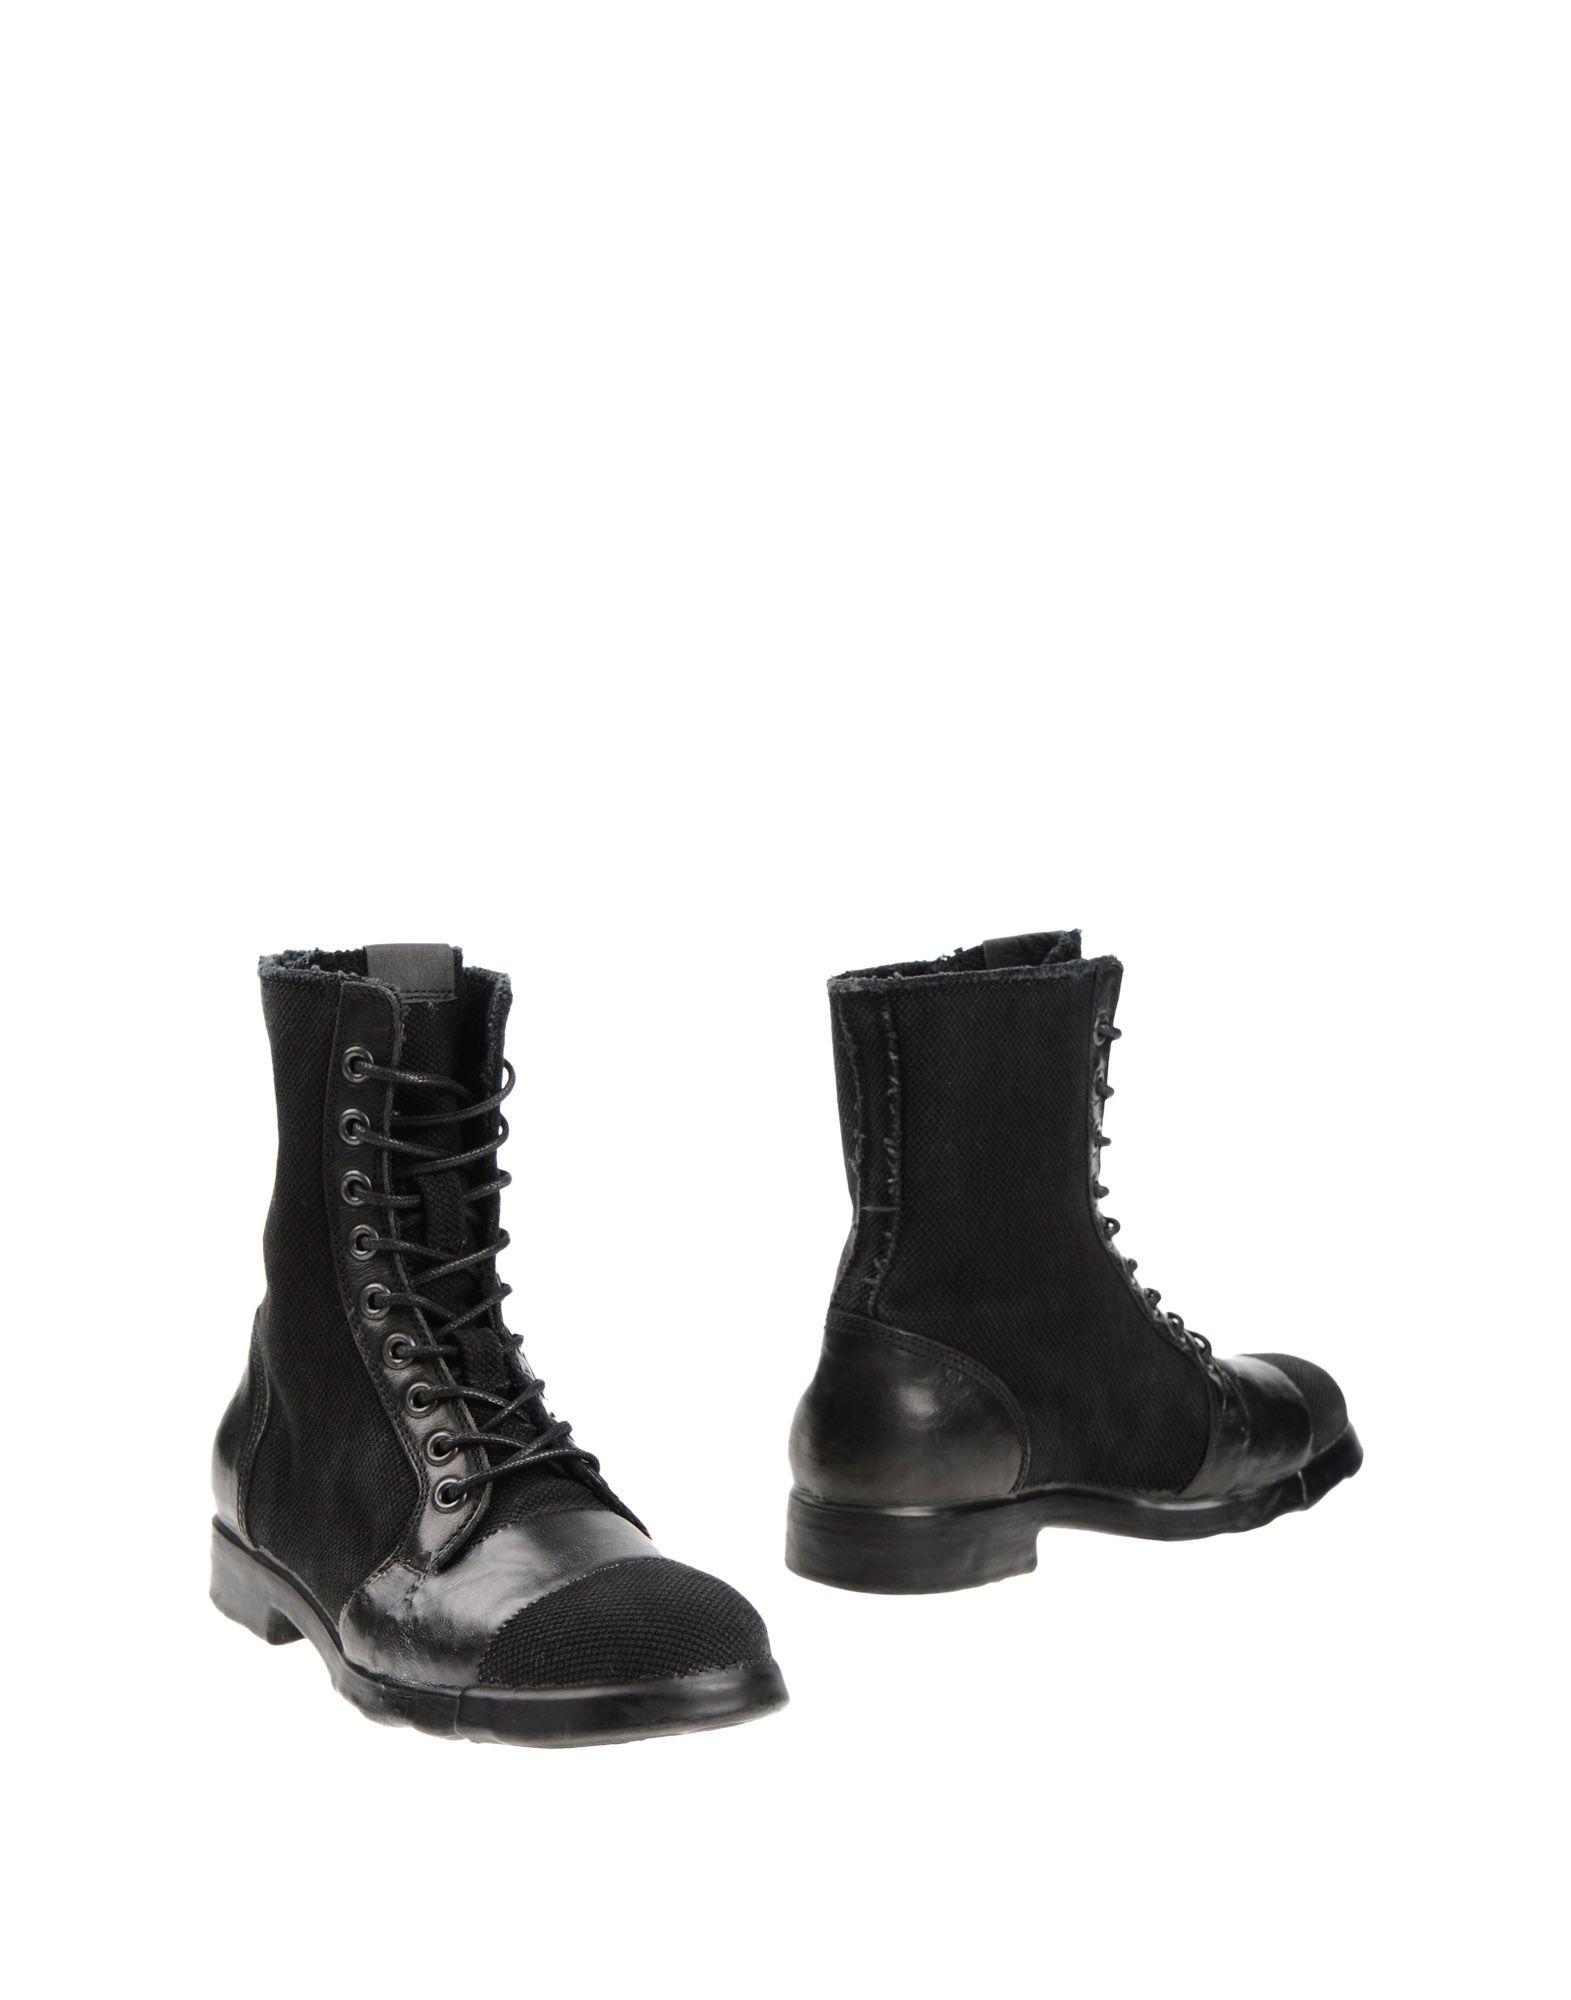 Rubber Soul Stiefelette Damen  11399230ET Gute Qualität beliebte Schuhe